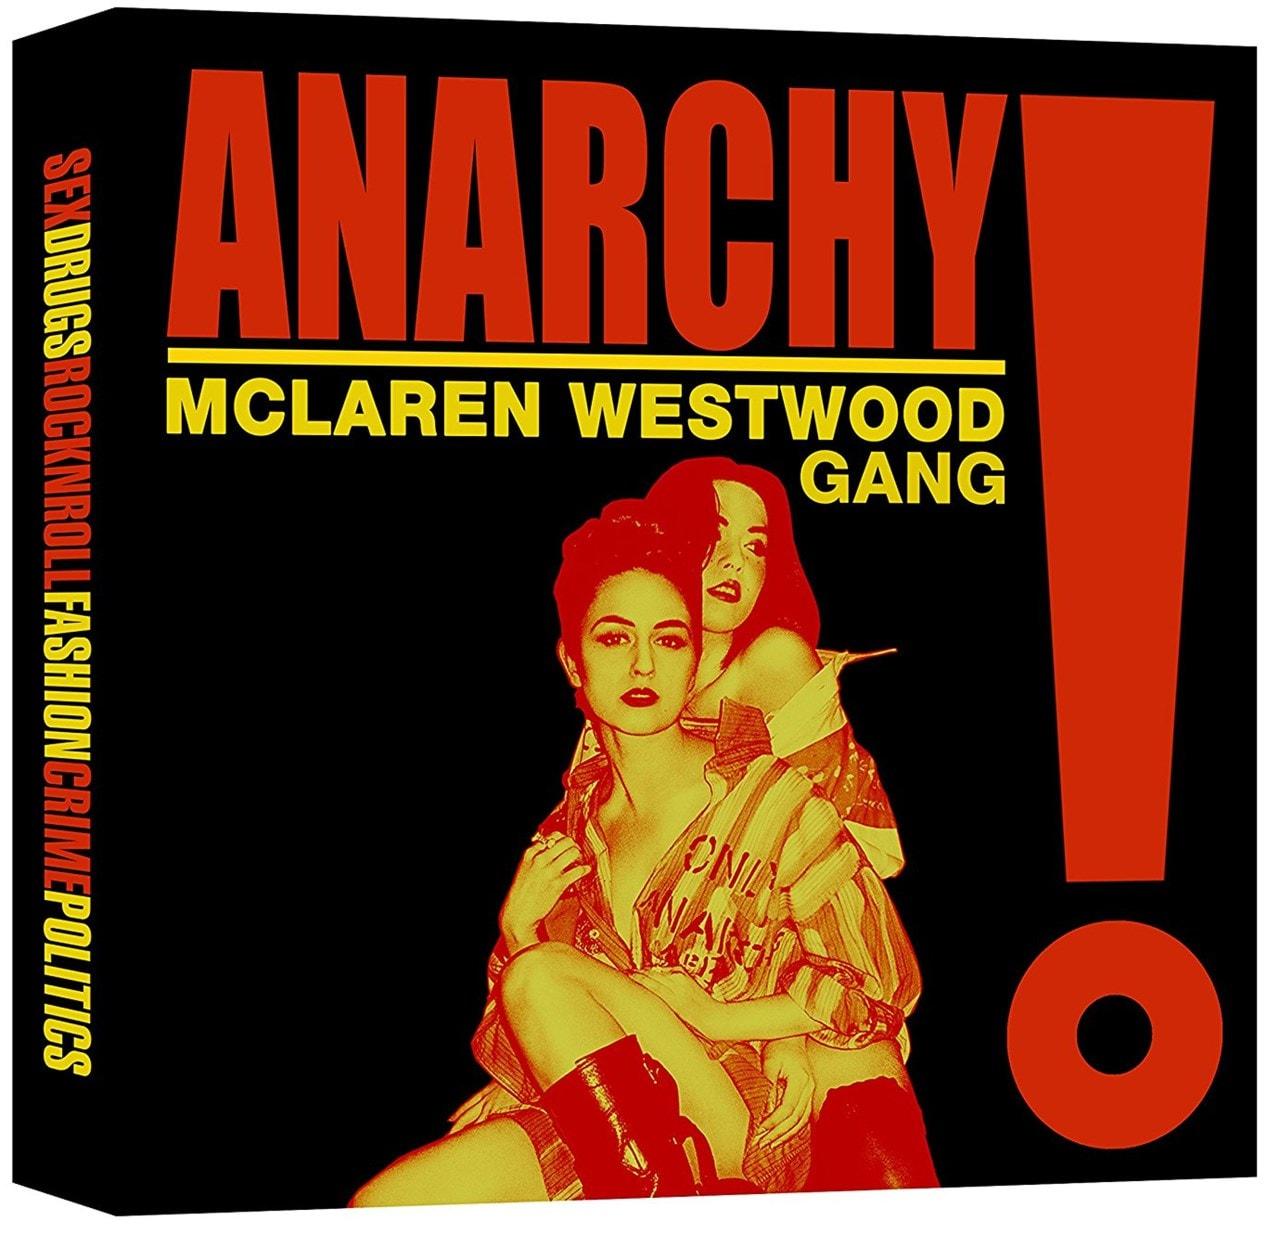 Anarchy! McLaren Westwood Gang - 2